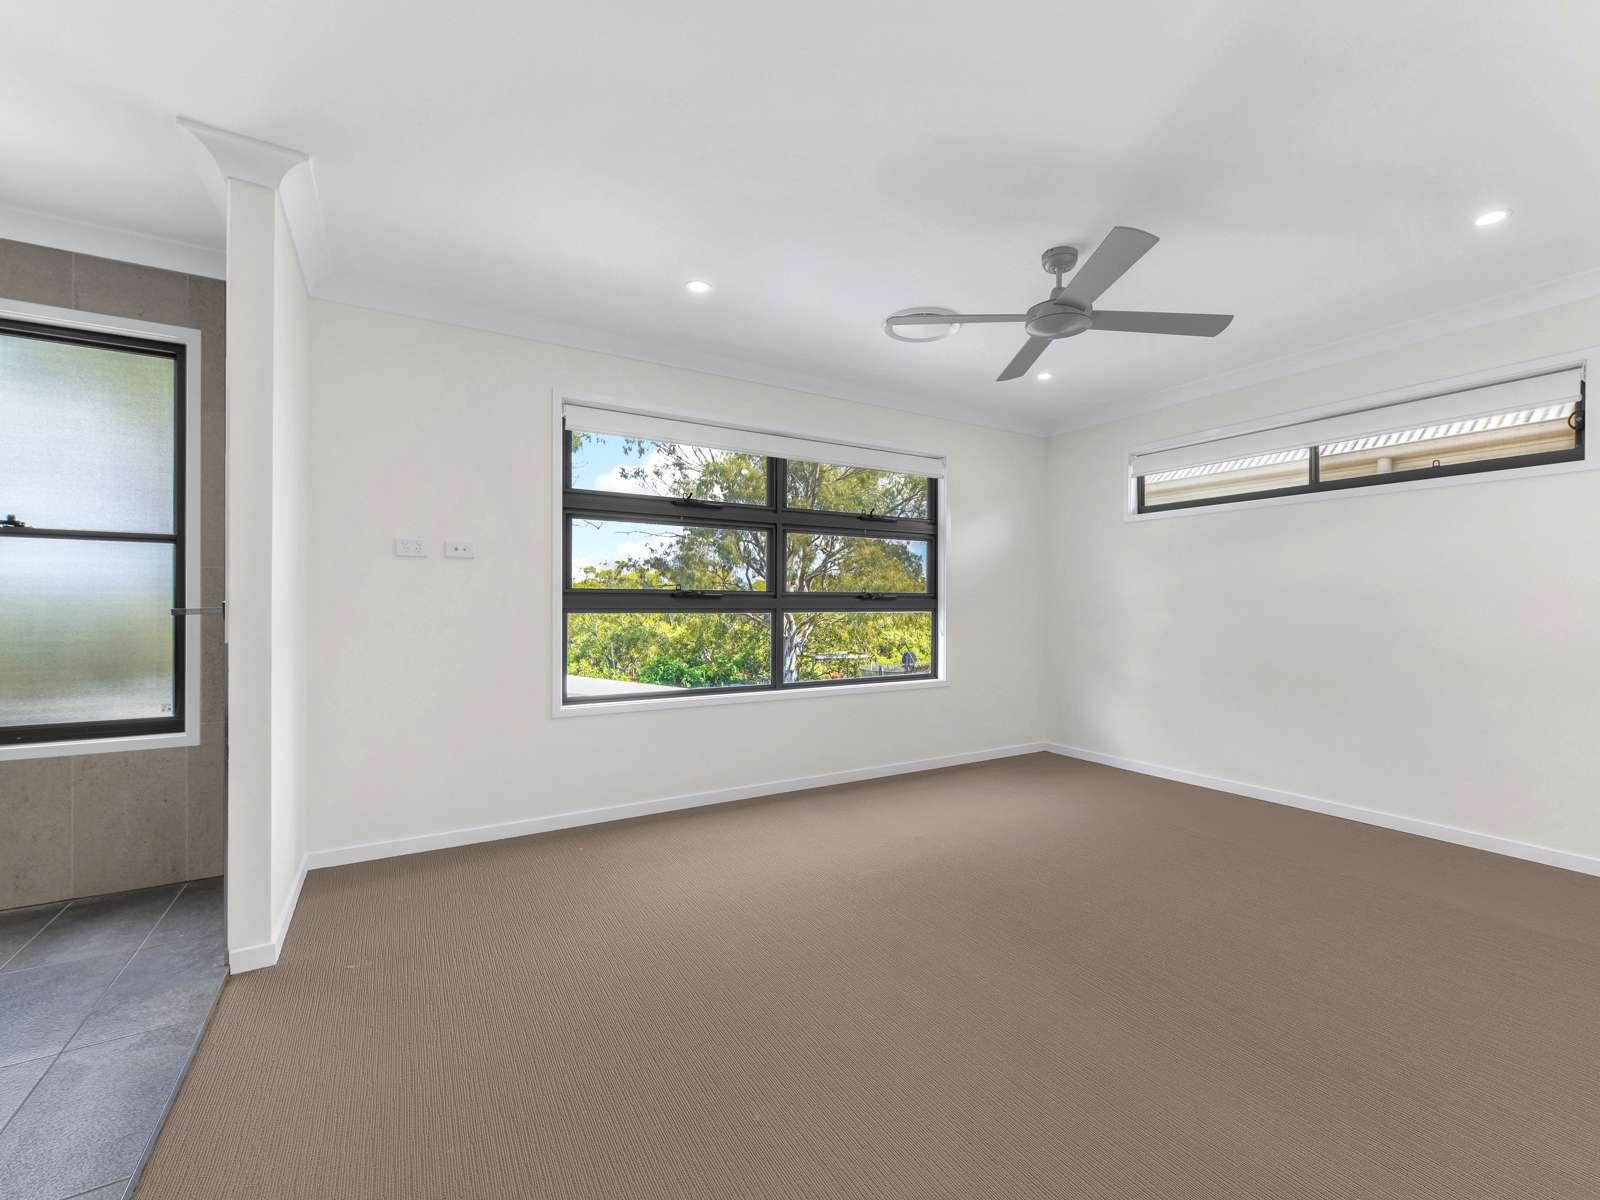 21 Chaseley Street, Nudgee Beach, QLD 4014